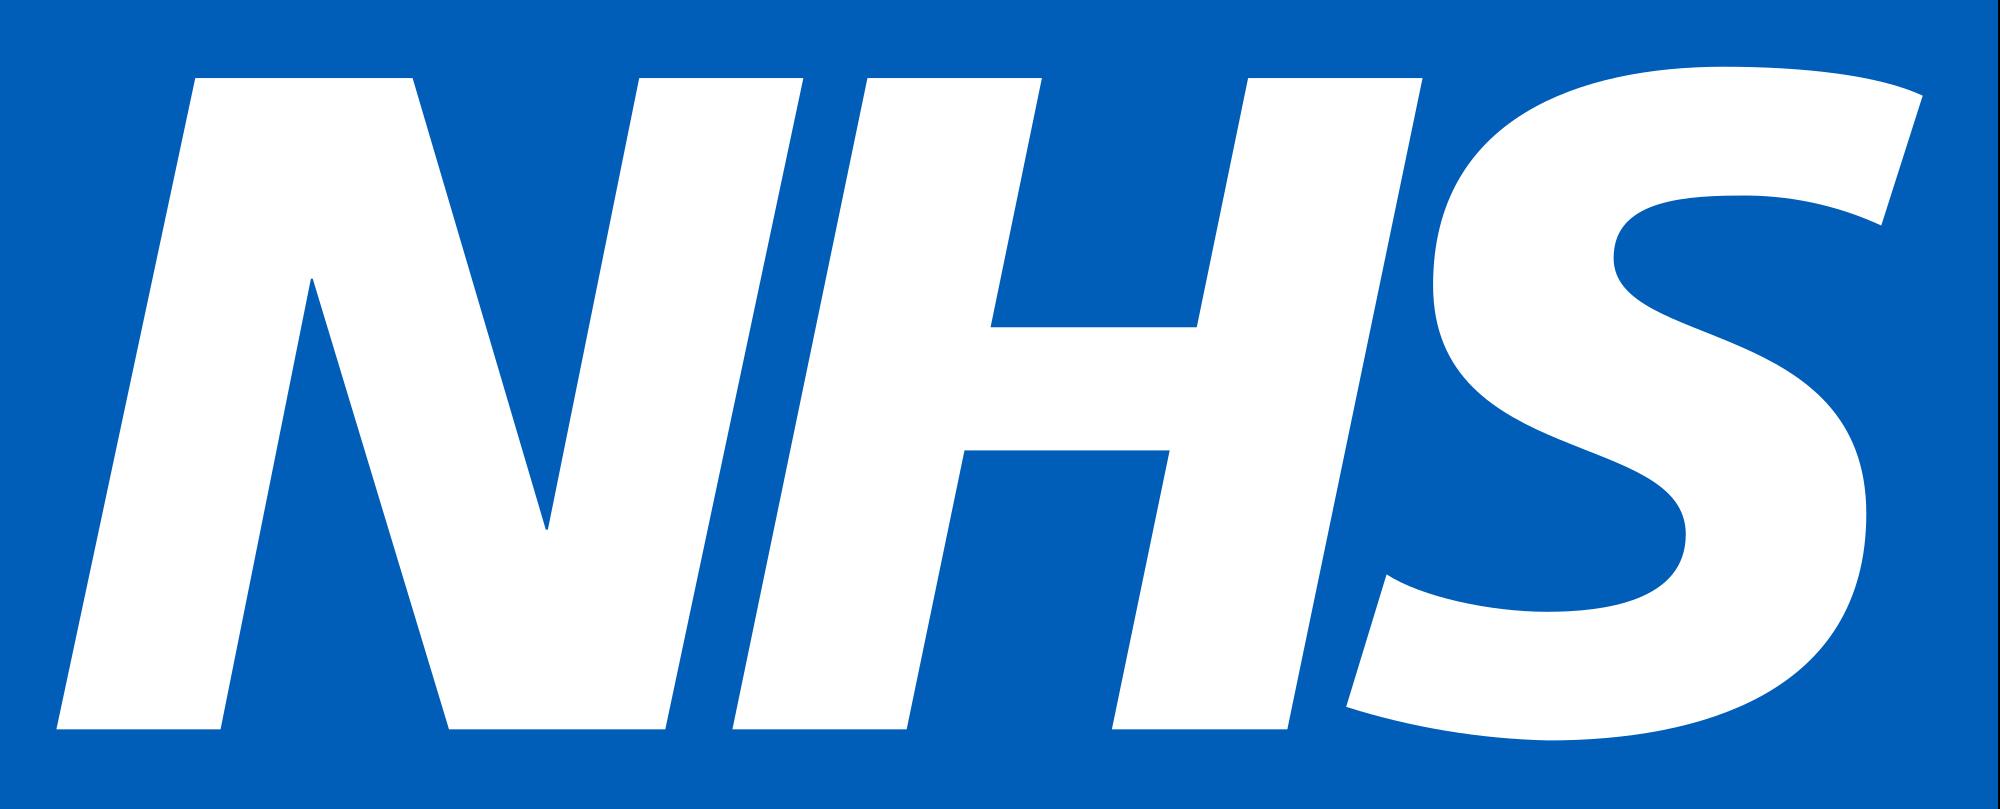 Make working in the NHS rewarding